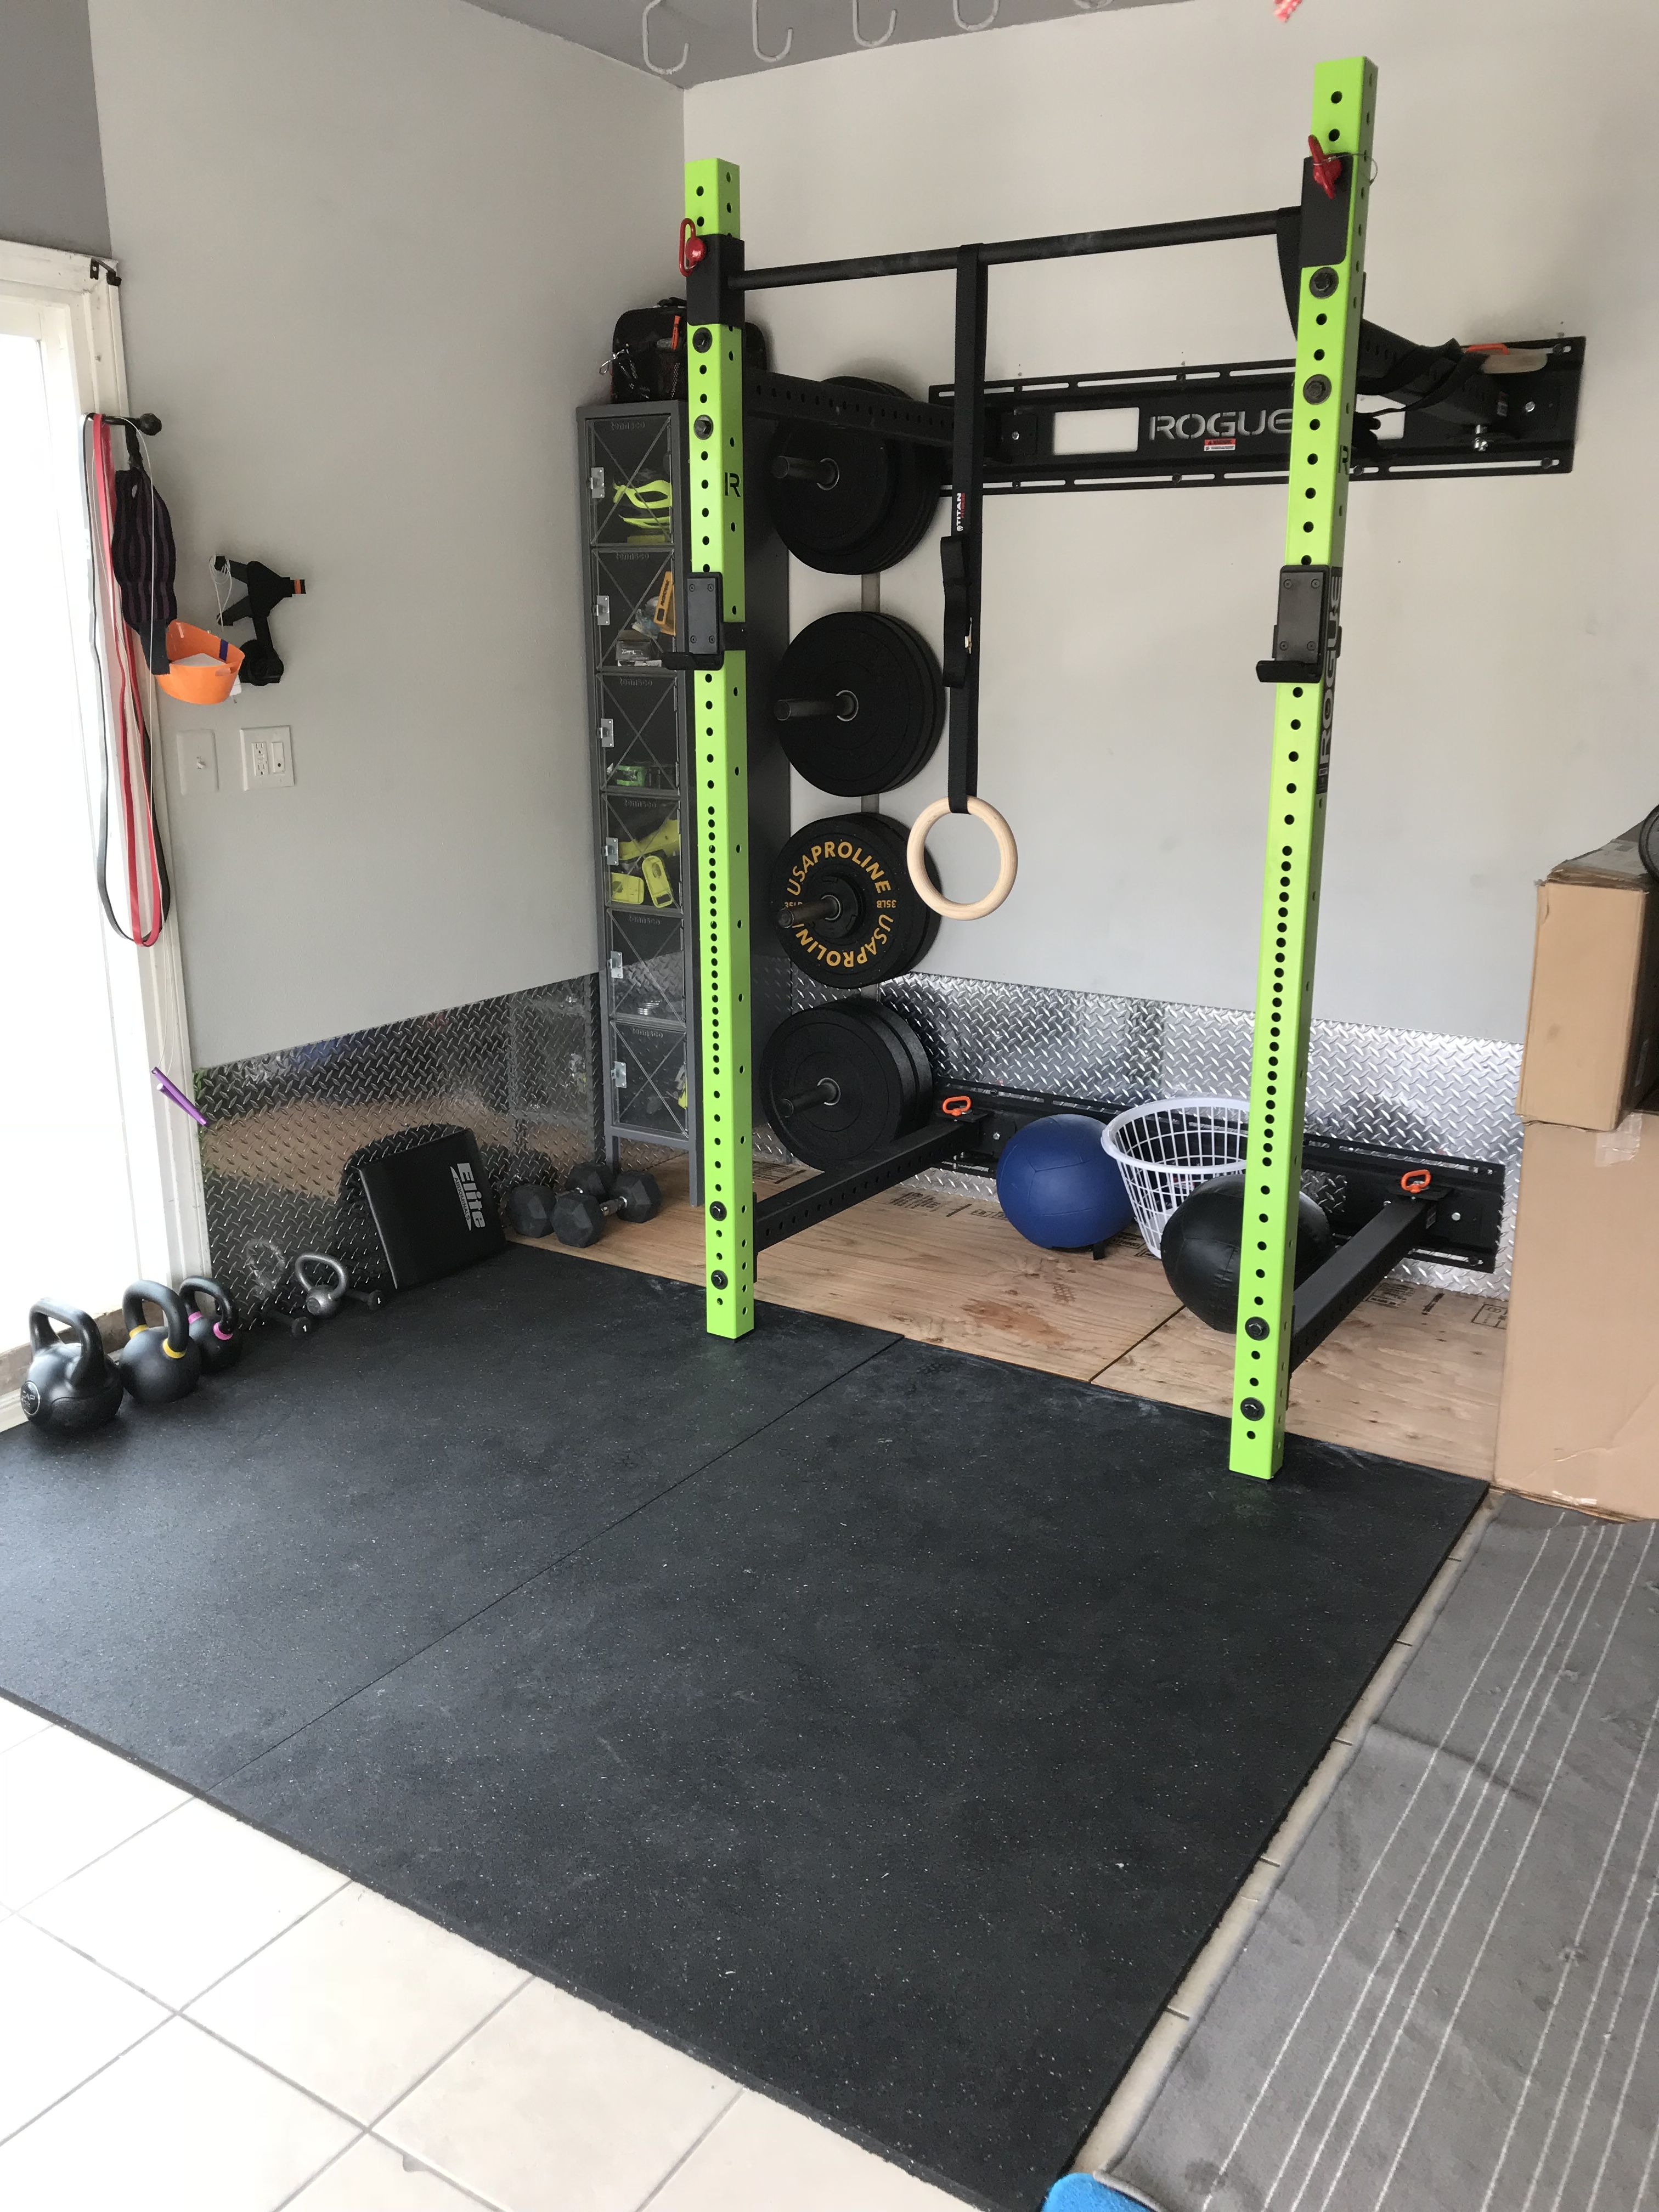 Rogue home gym monroy gym in 2019 at home gym backyard gym